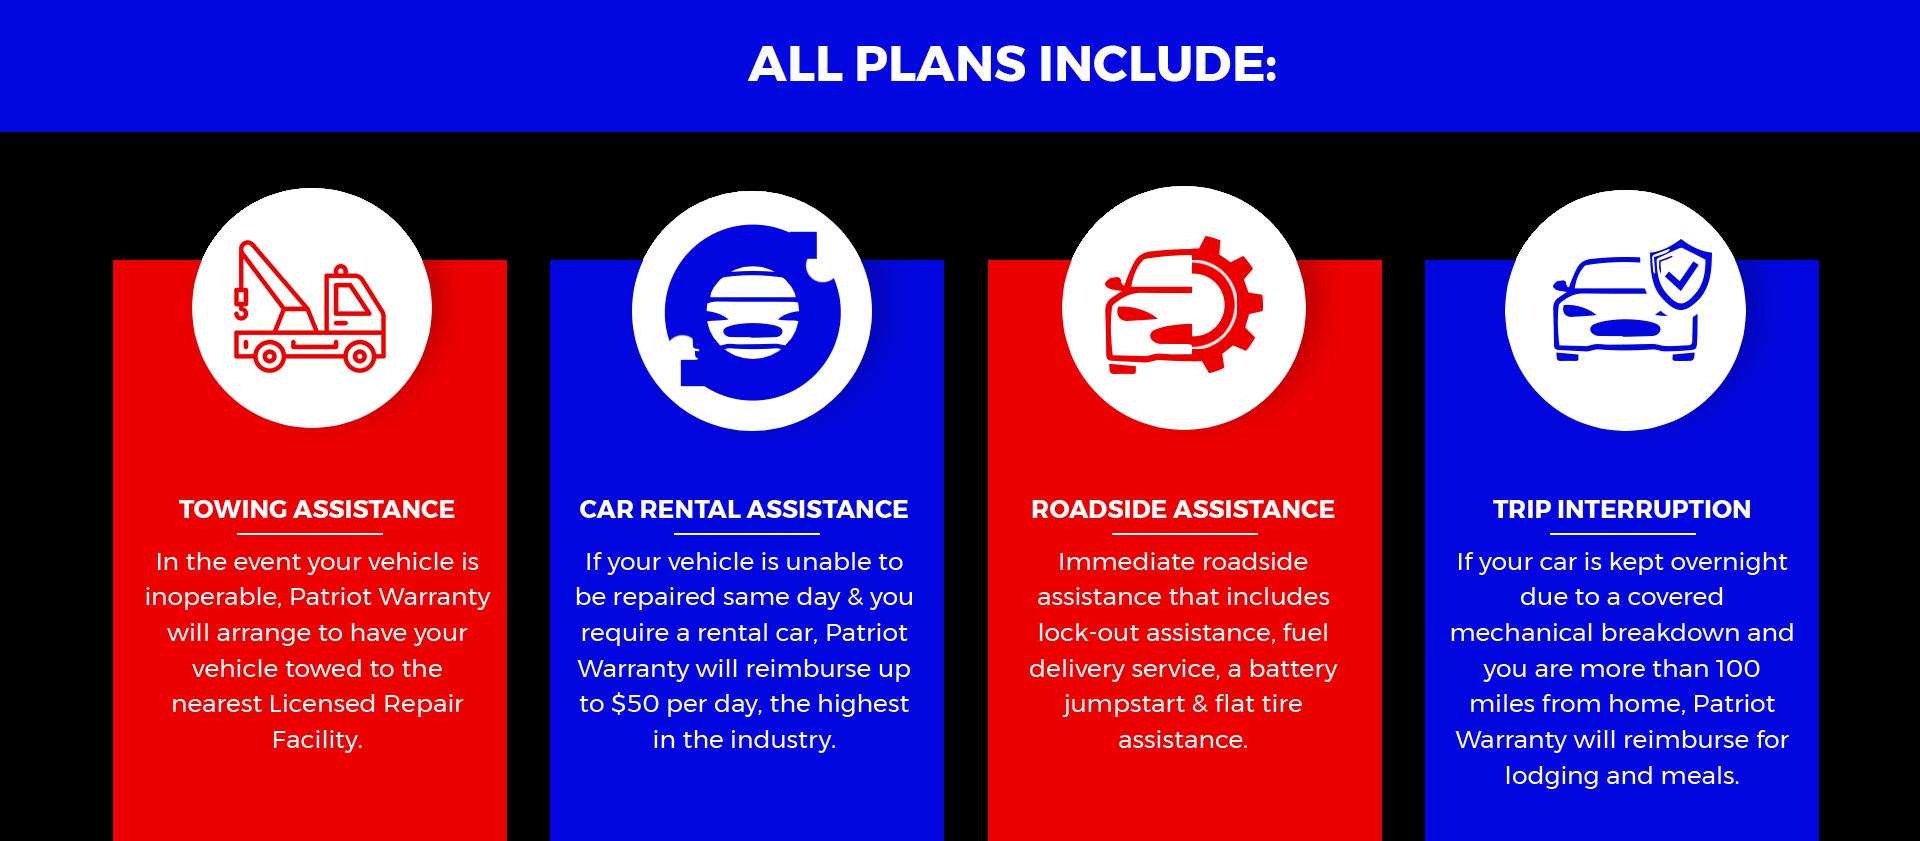 Car Rental Assistance